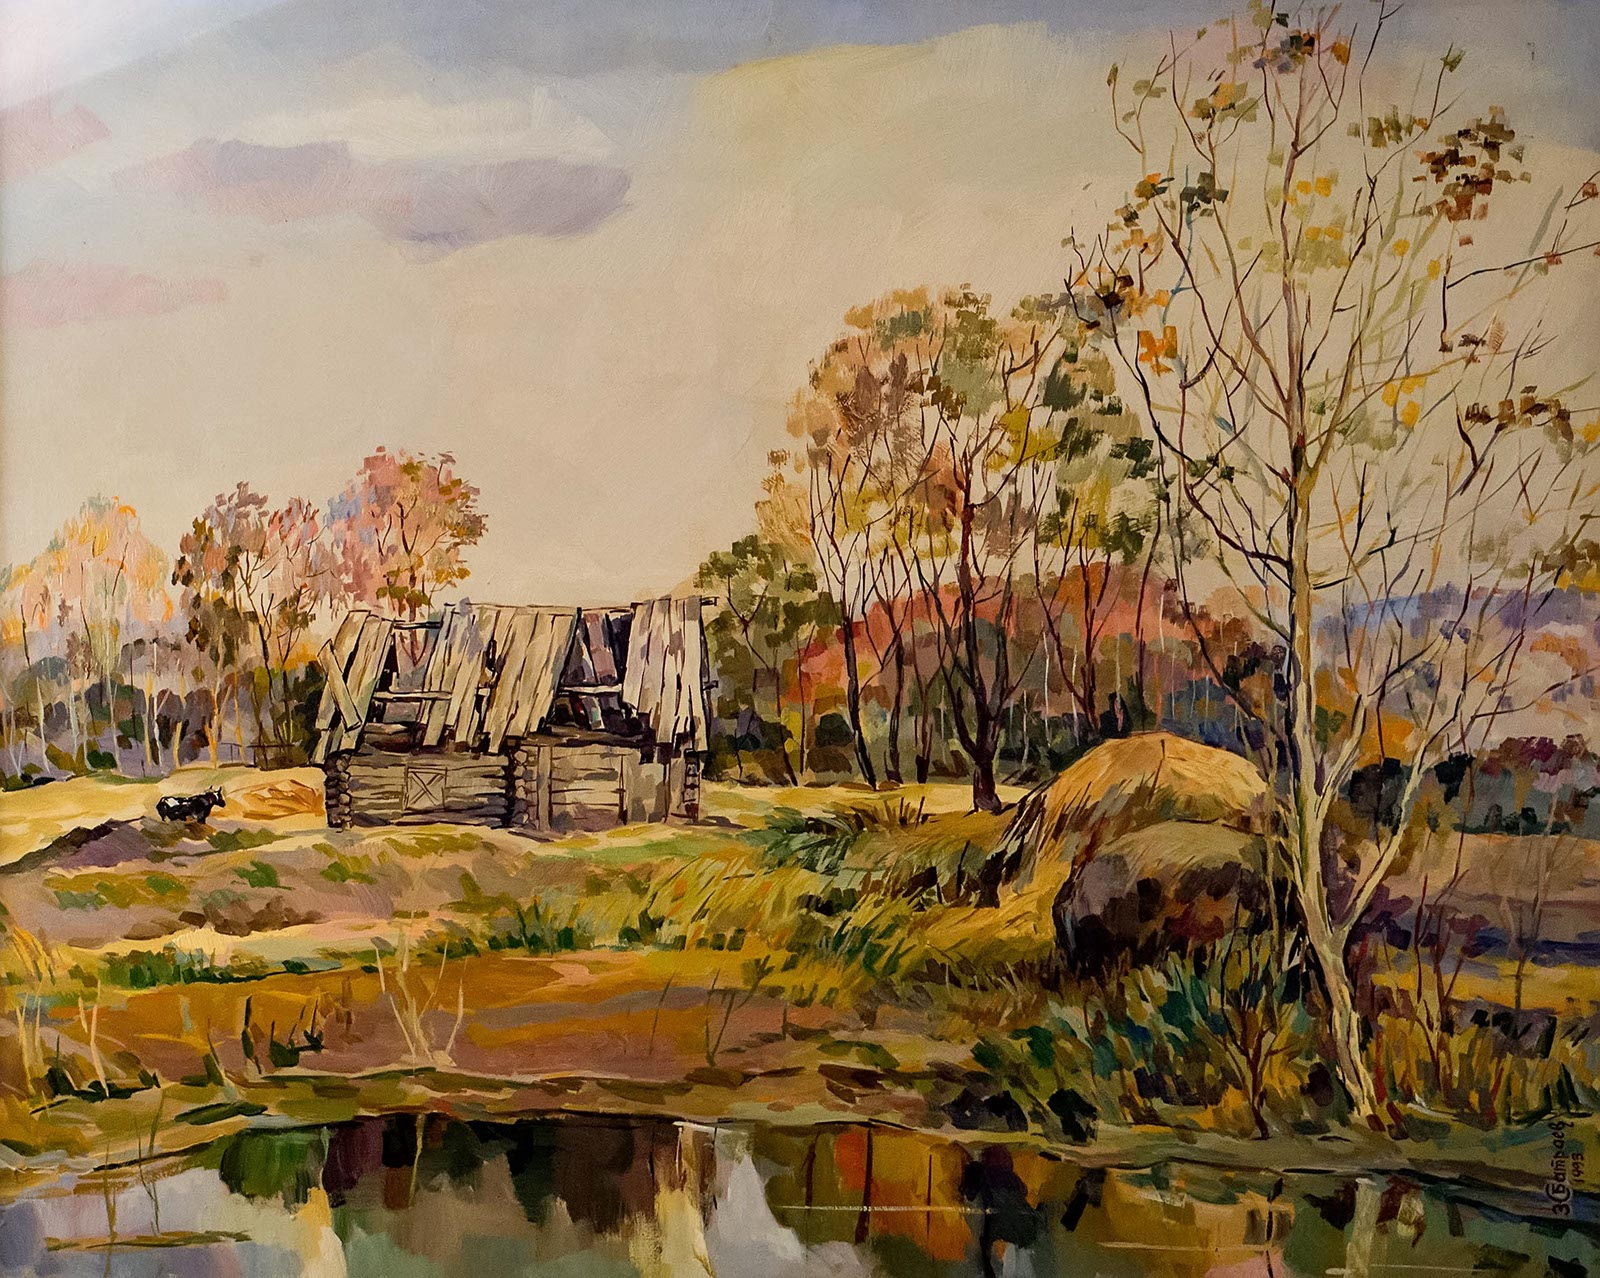 Фото №118255. Осенний день. Закир Батраев